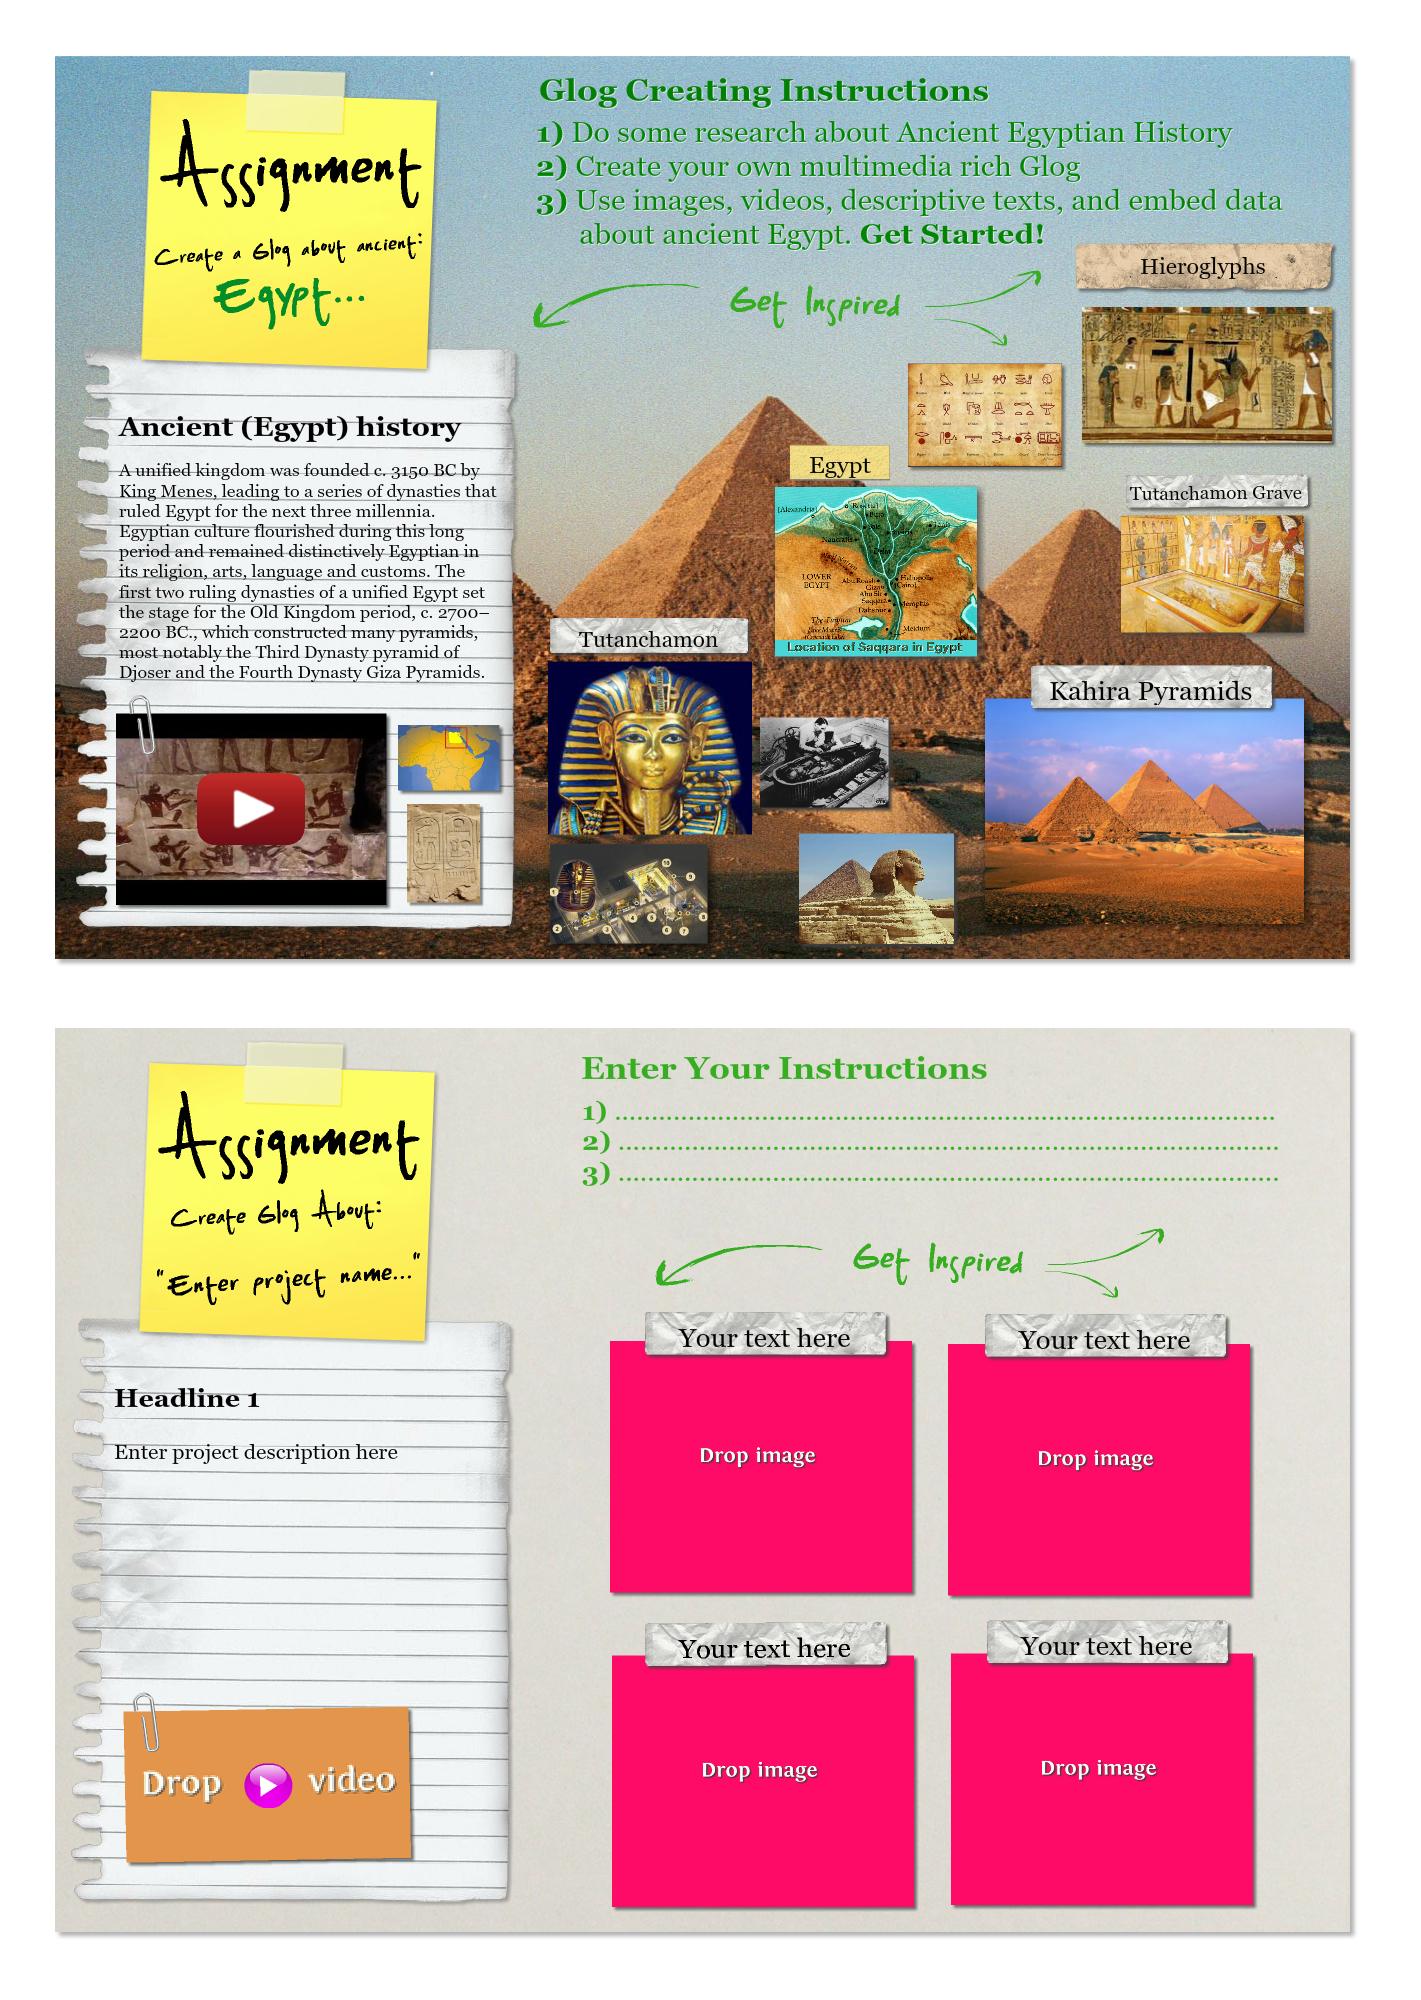 ancient egypt horizontal glog template